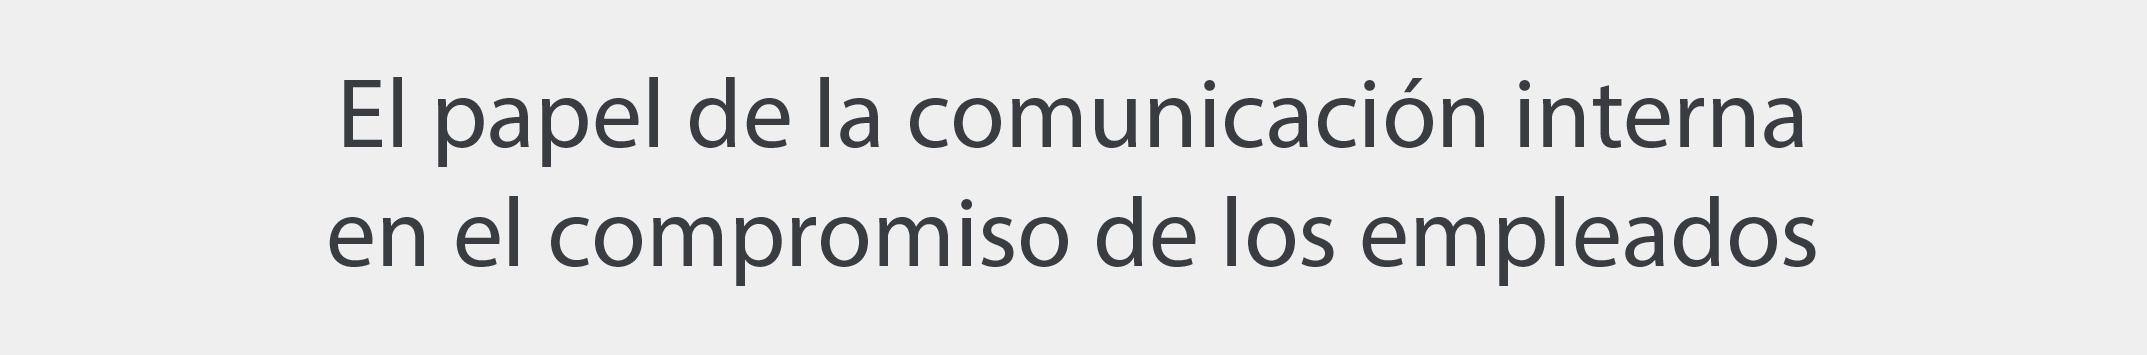 Papel comunicacion interna compromiso empleados